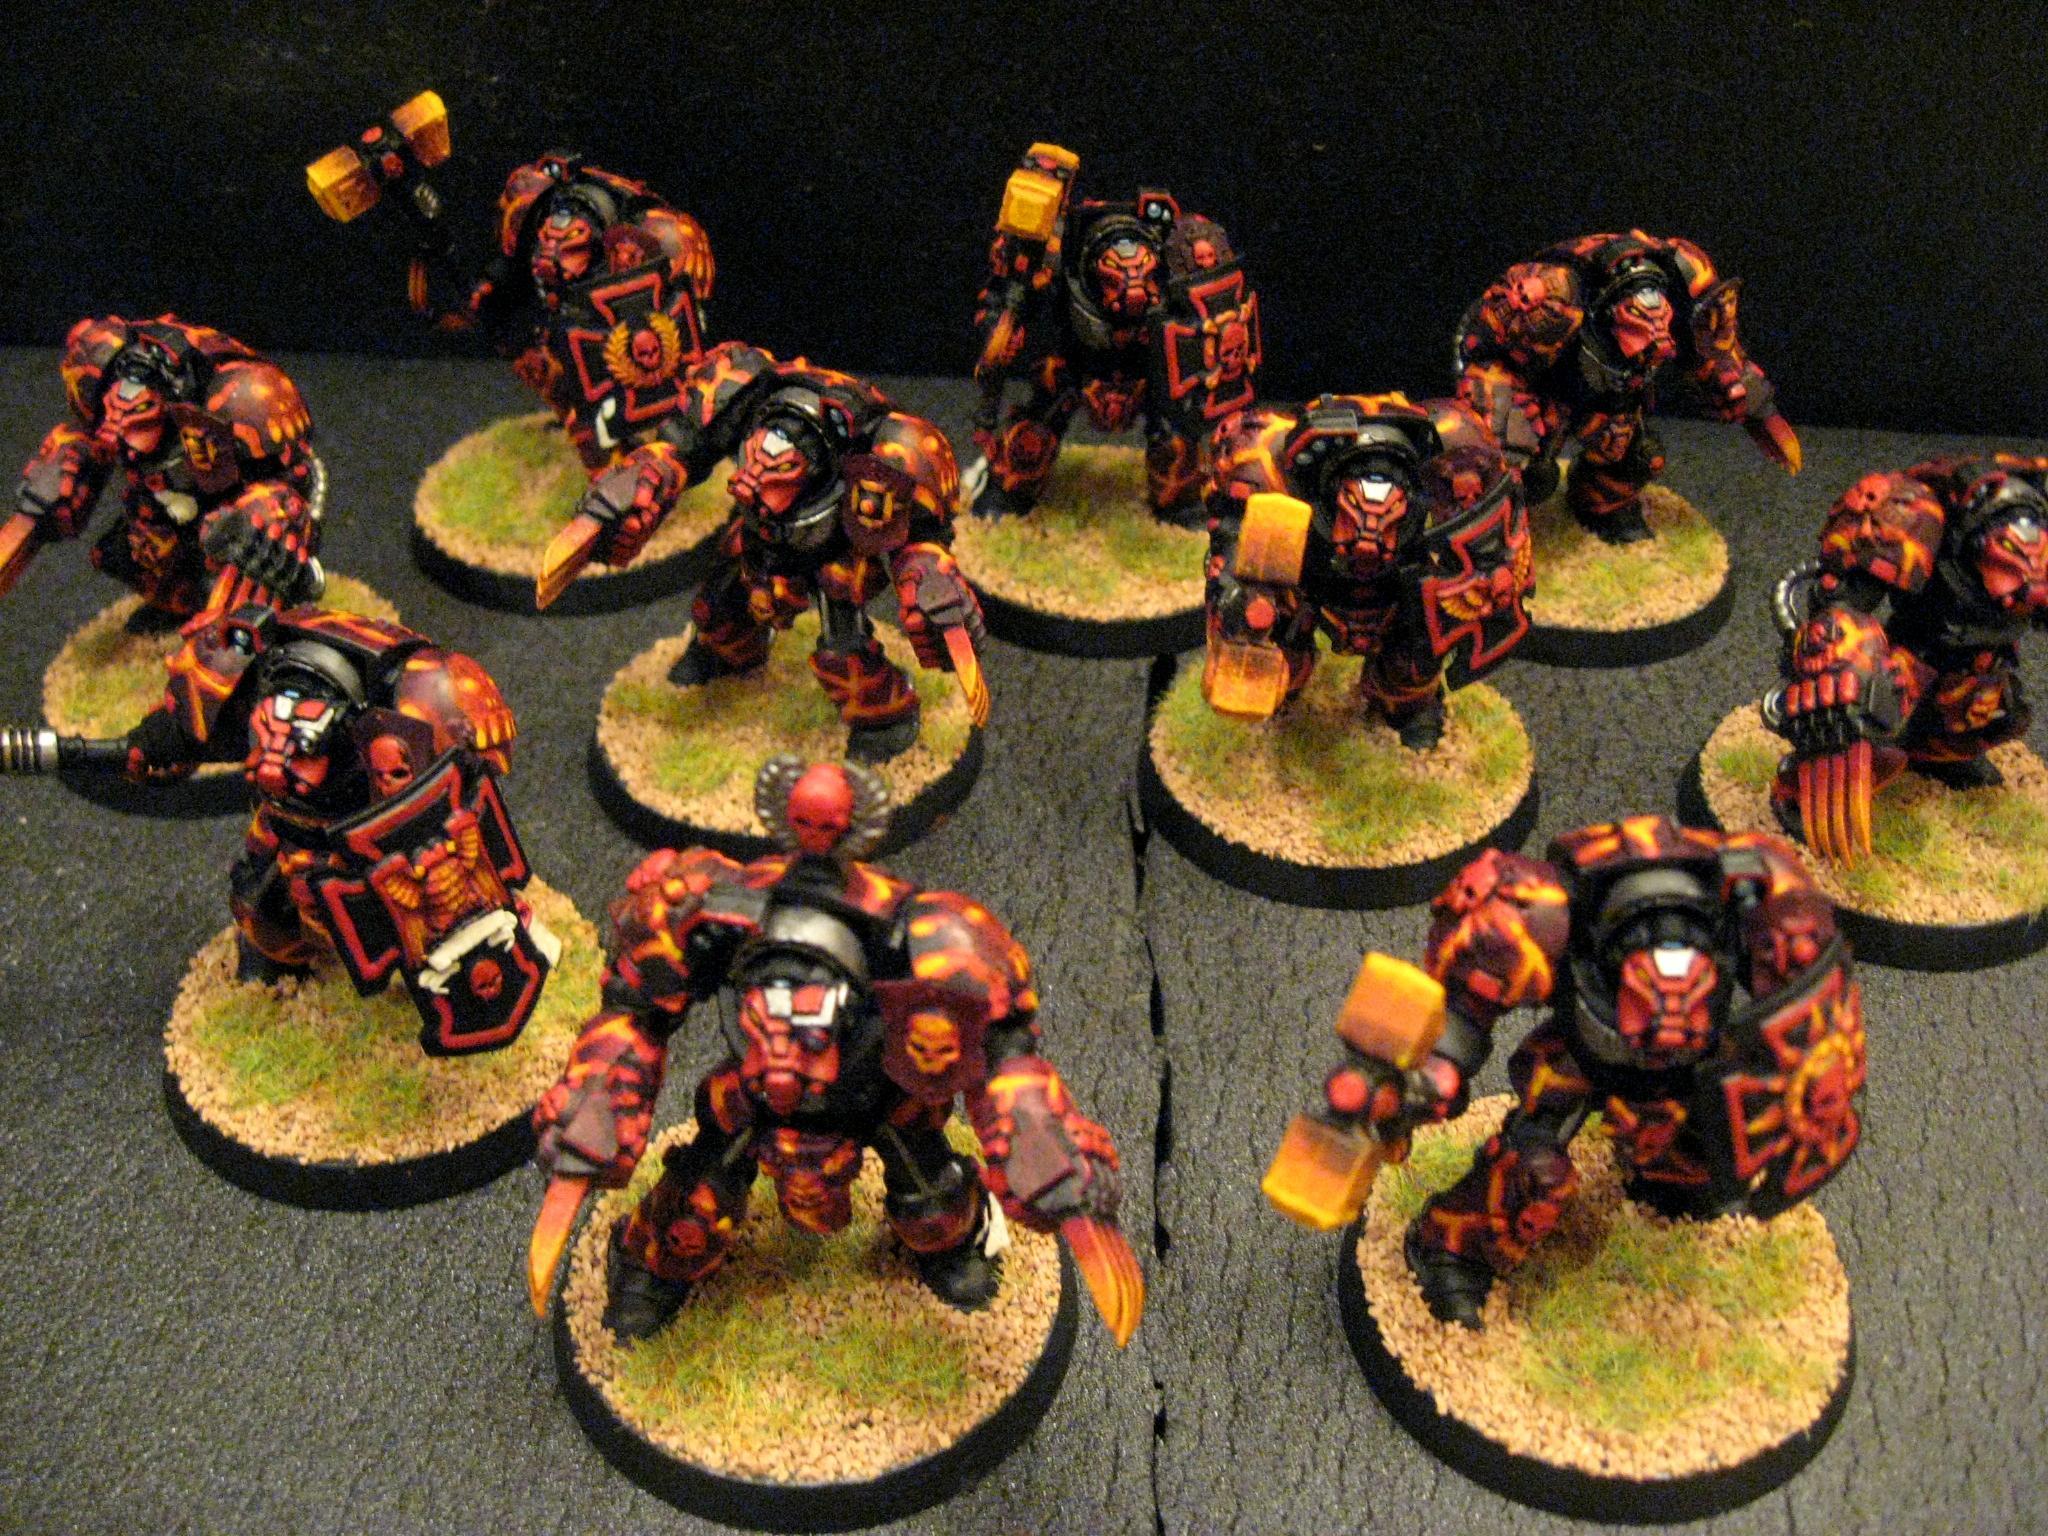 Chapter, Custom, Salamanders, Space Marines, Tactical, Terminator Armor, Terminator Assault Squad, Vanilla, Vulkan